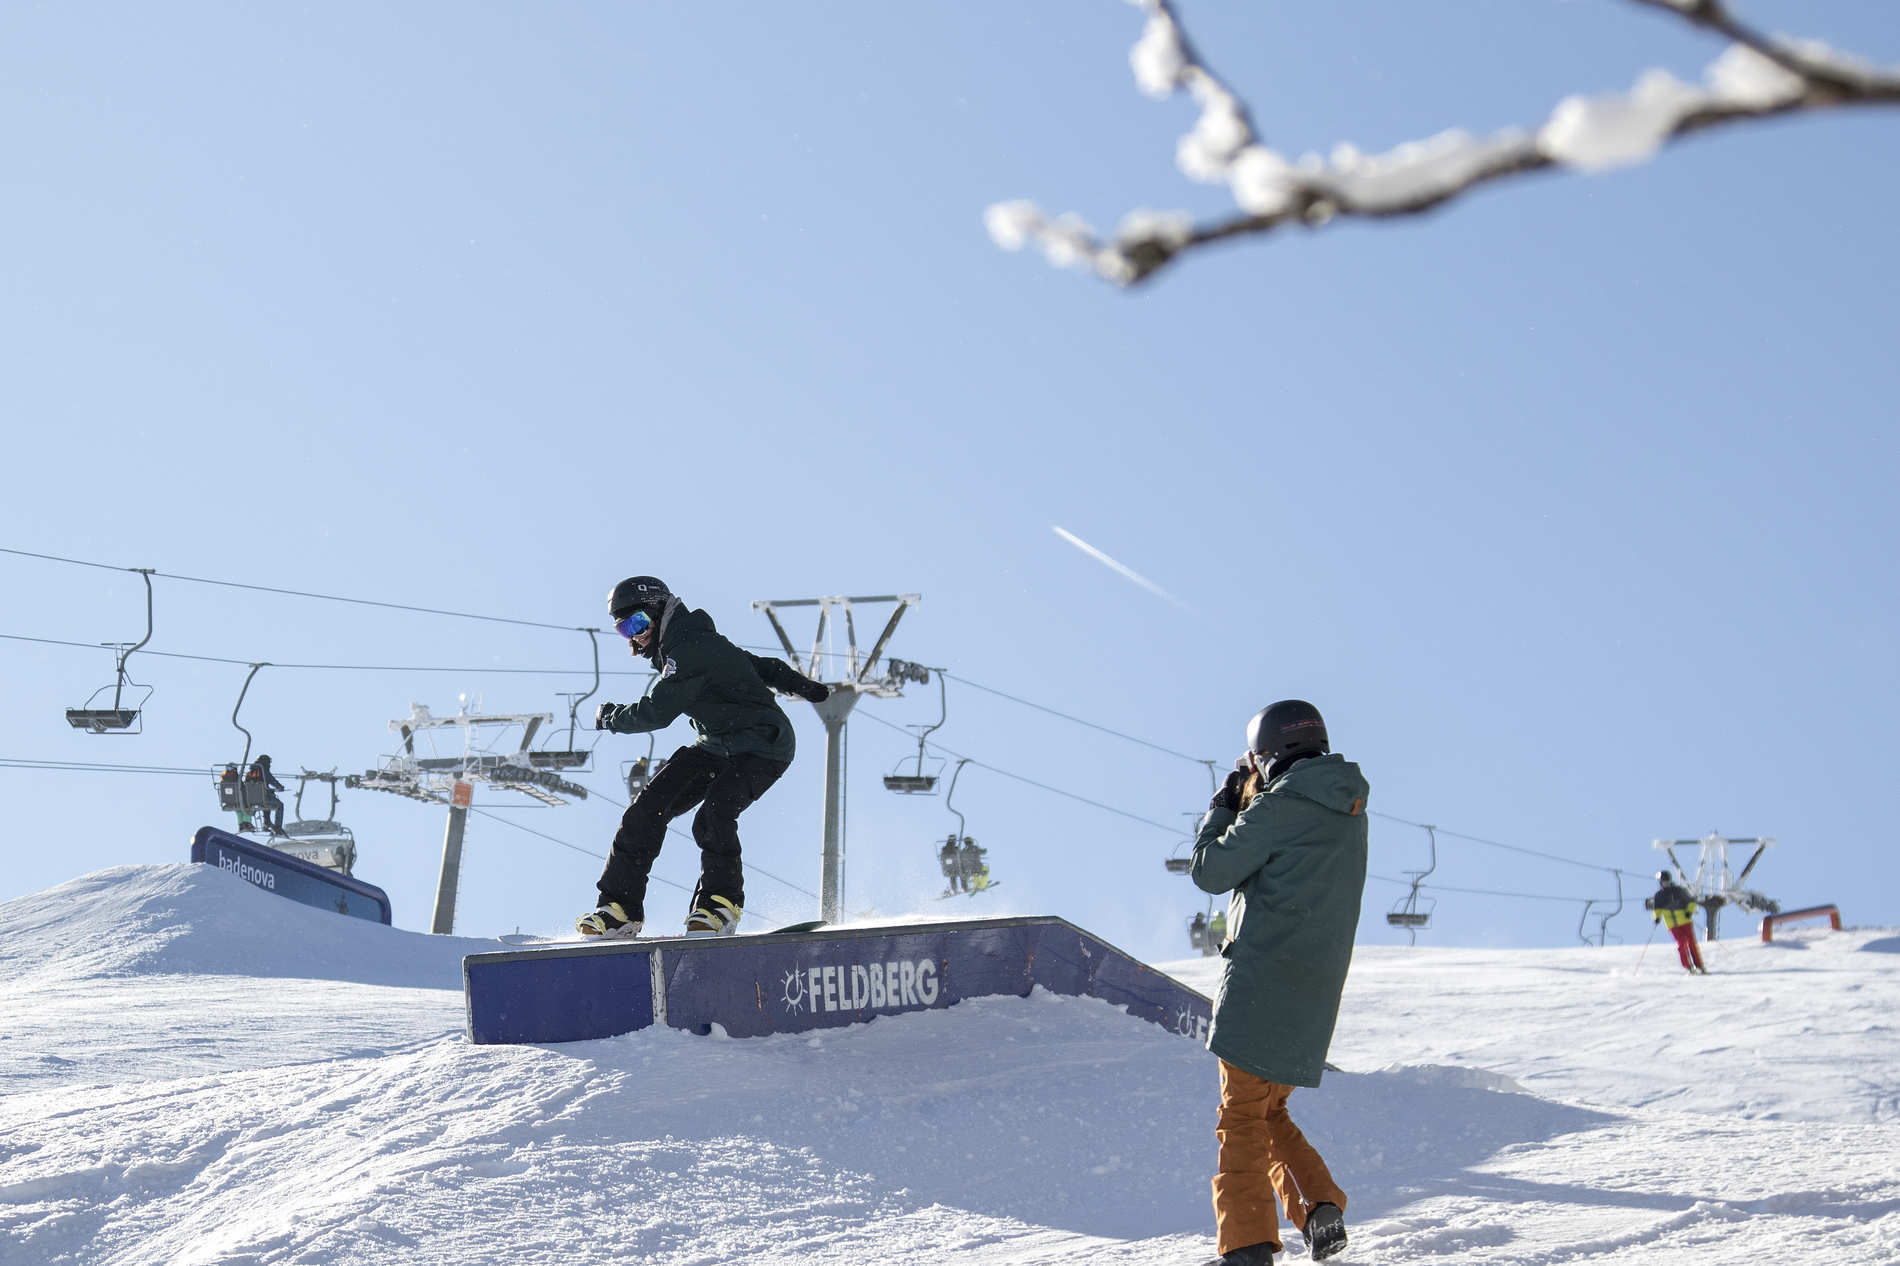 web snowpark feldberg 24 02 2018 action sb alex martin herrmann qparks 12